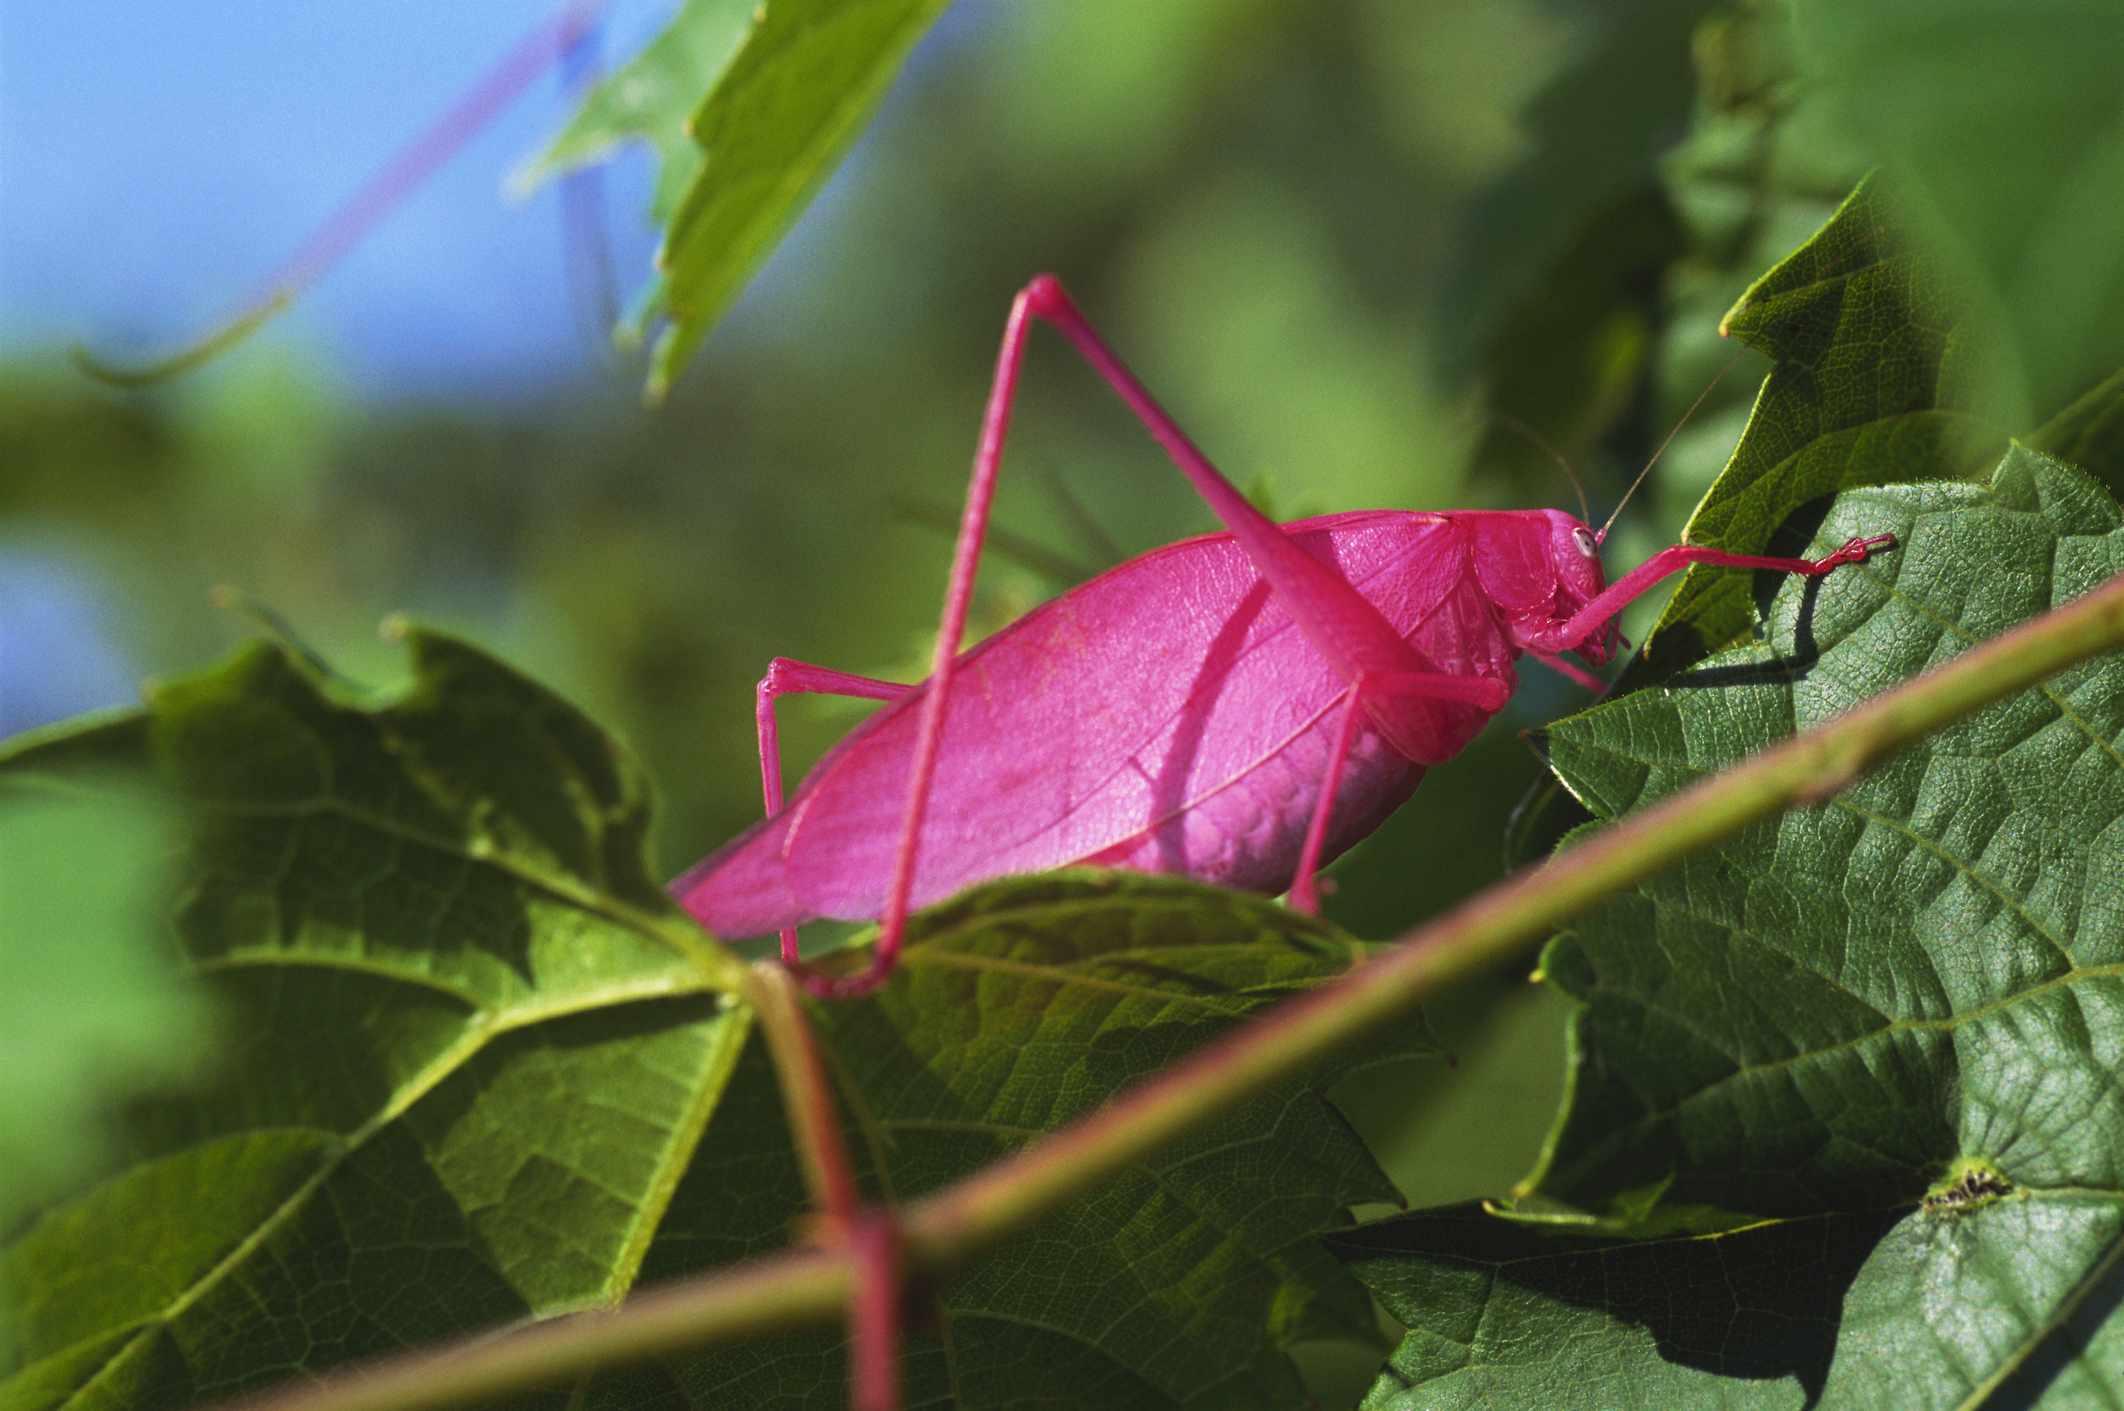 Pink Katydid walking on a vine